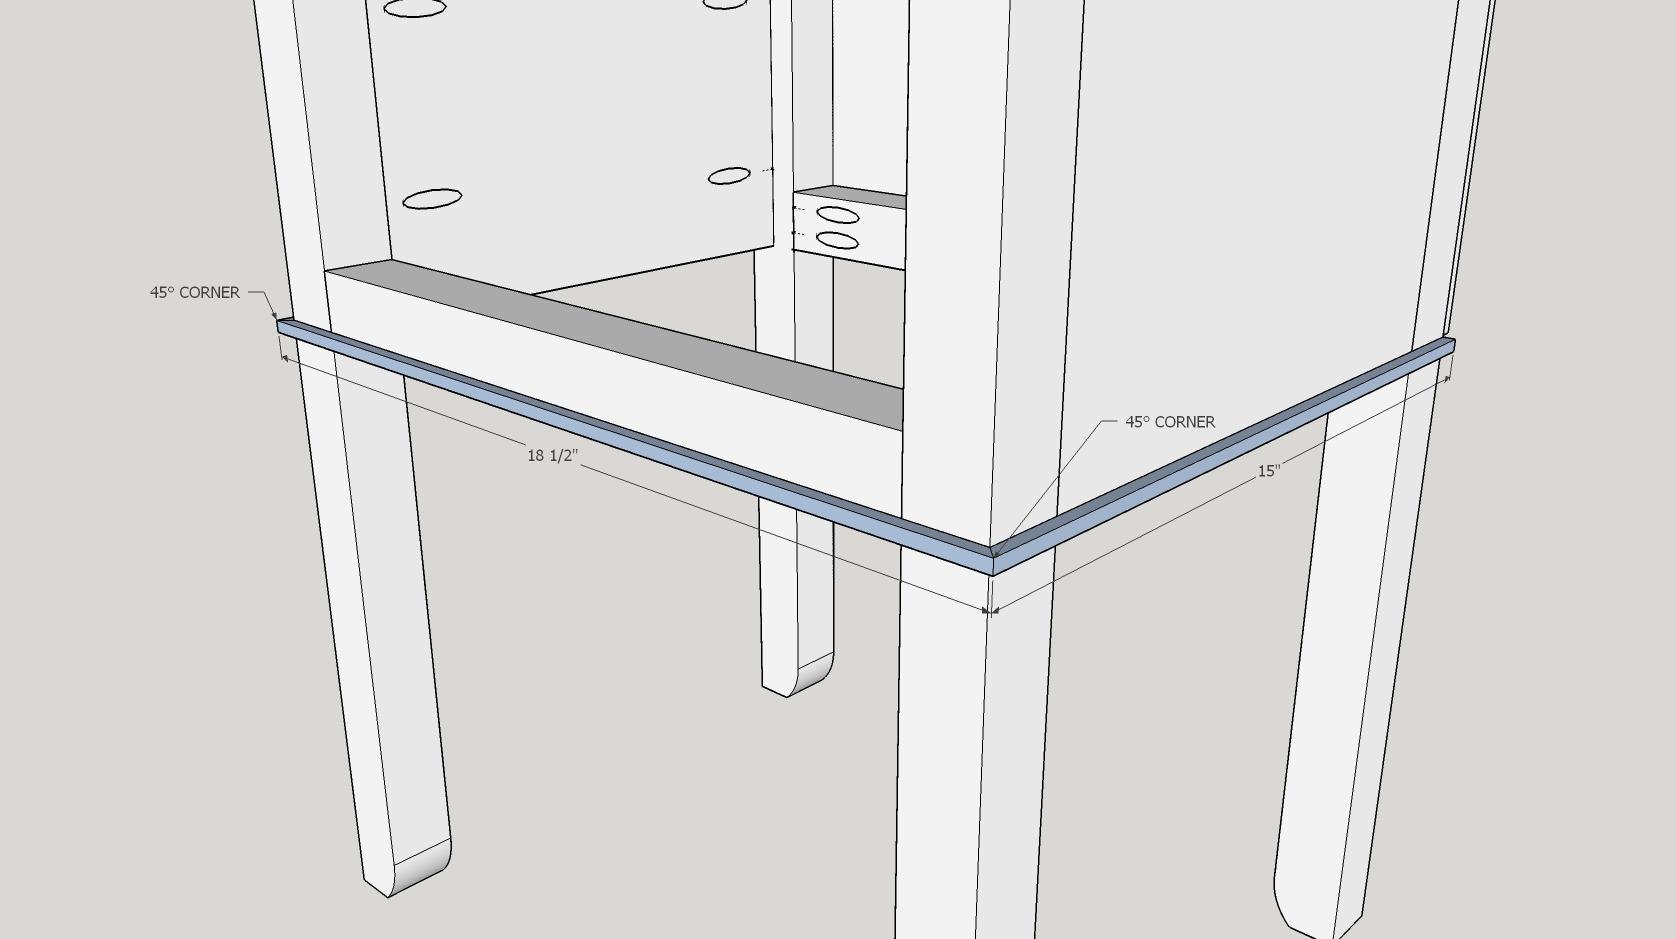 free end table plans the diy hubs drawer nightstand blueprints ashley furniture wood bedroom set black marble coffee medium oak sets pallet outside home patio brand promotion